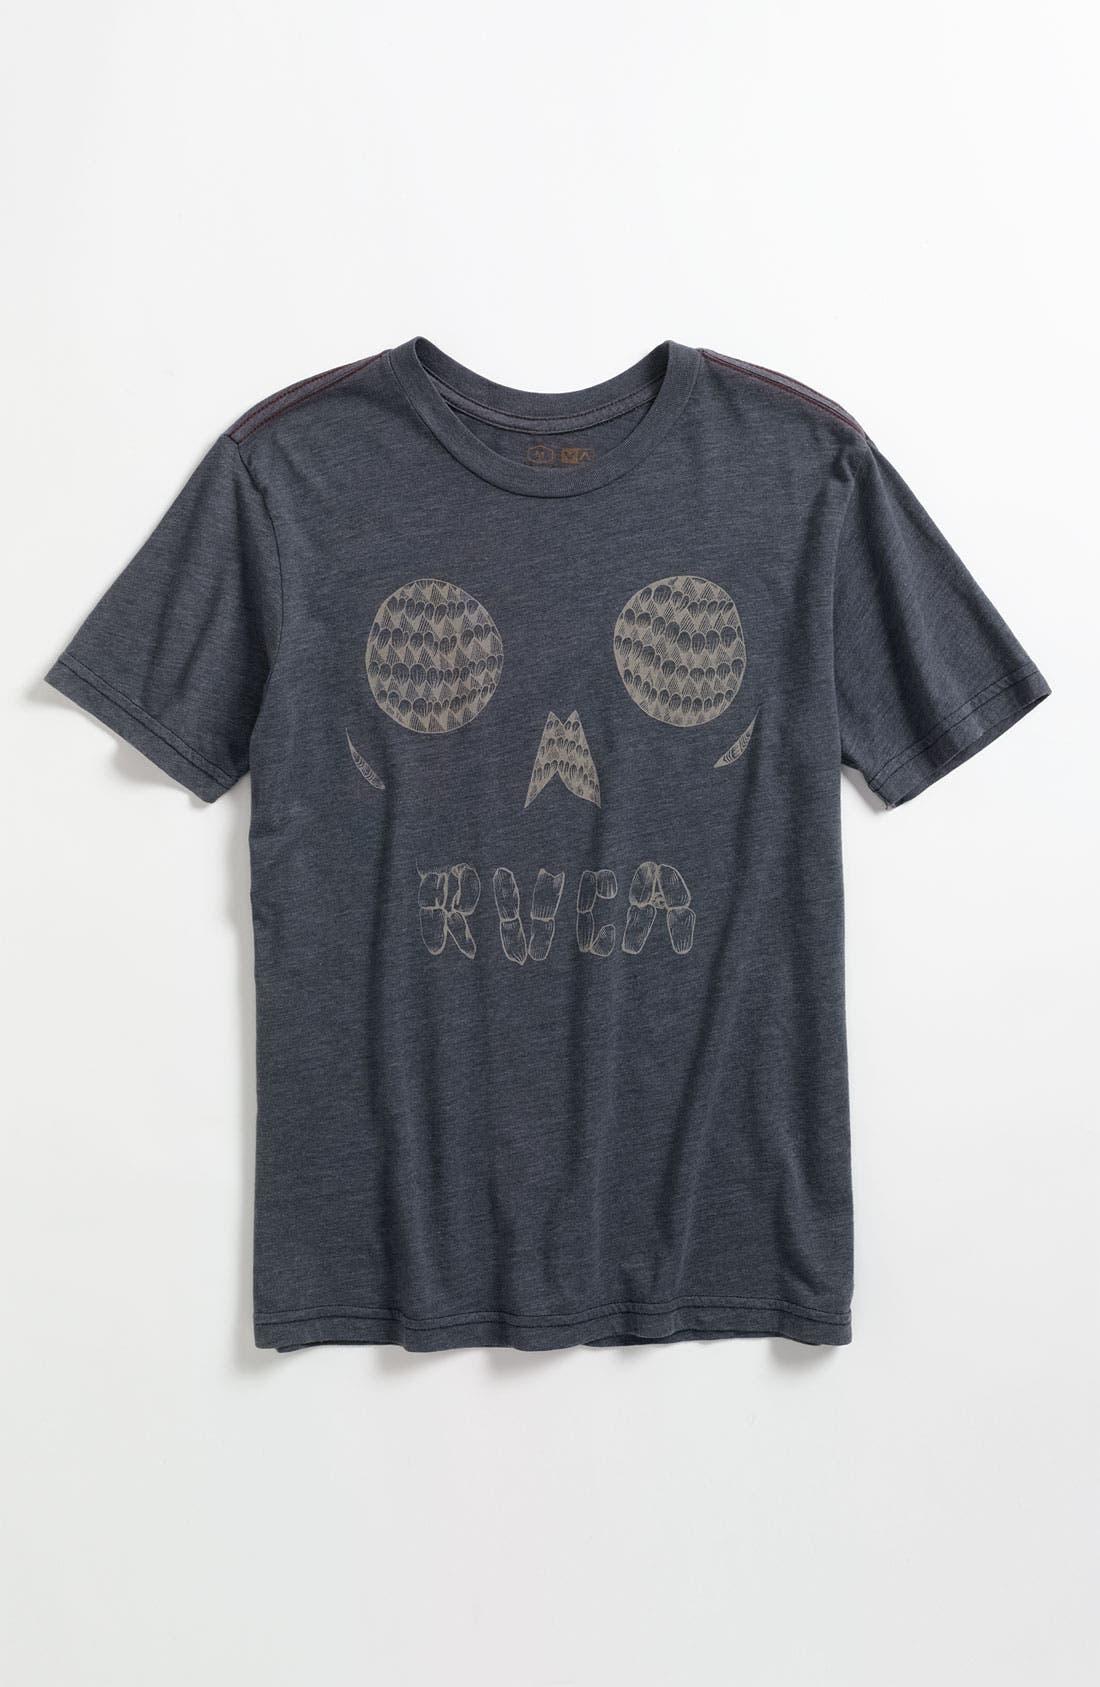 Alternate Image 1 Selected - RVCA 'Skull Face' T-Shirt (Big Boys)